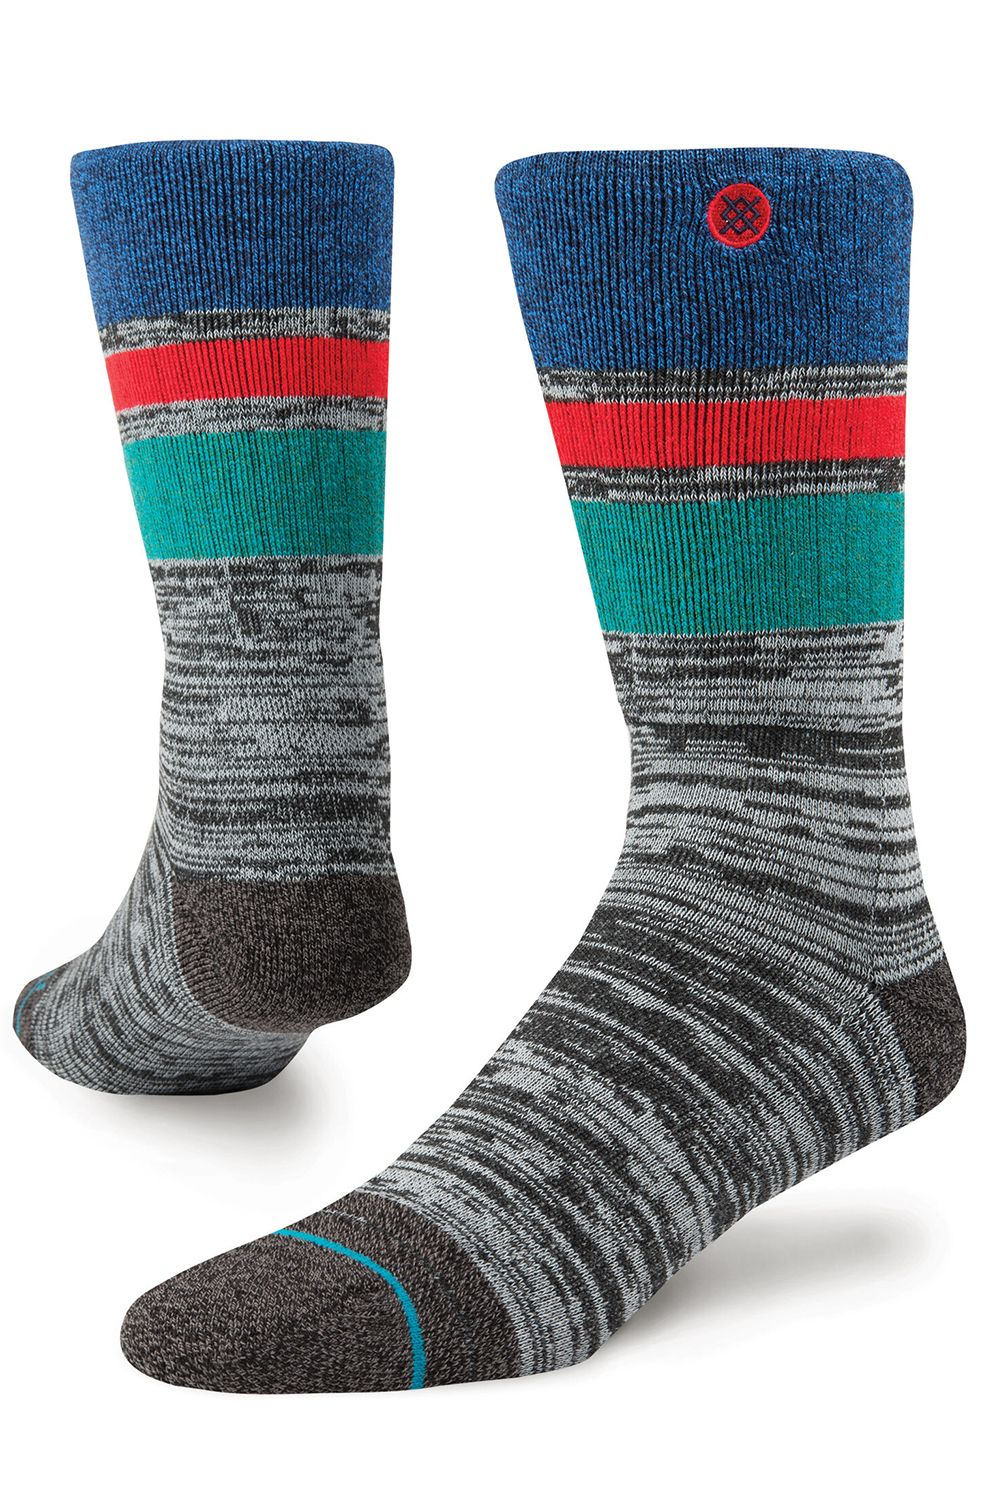 Stance Socks HITCHCOCK Black